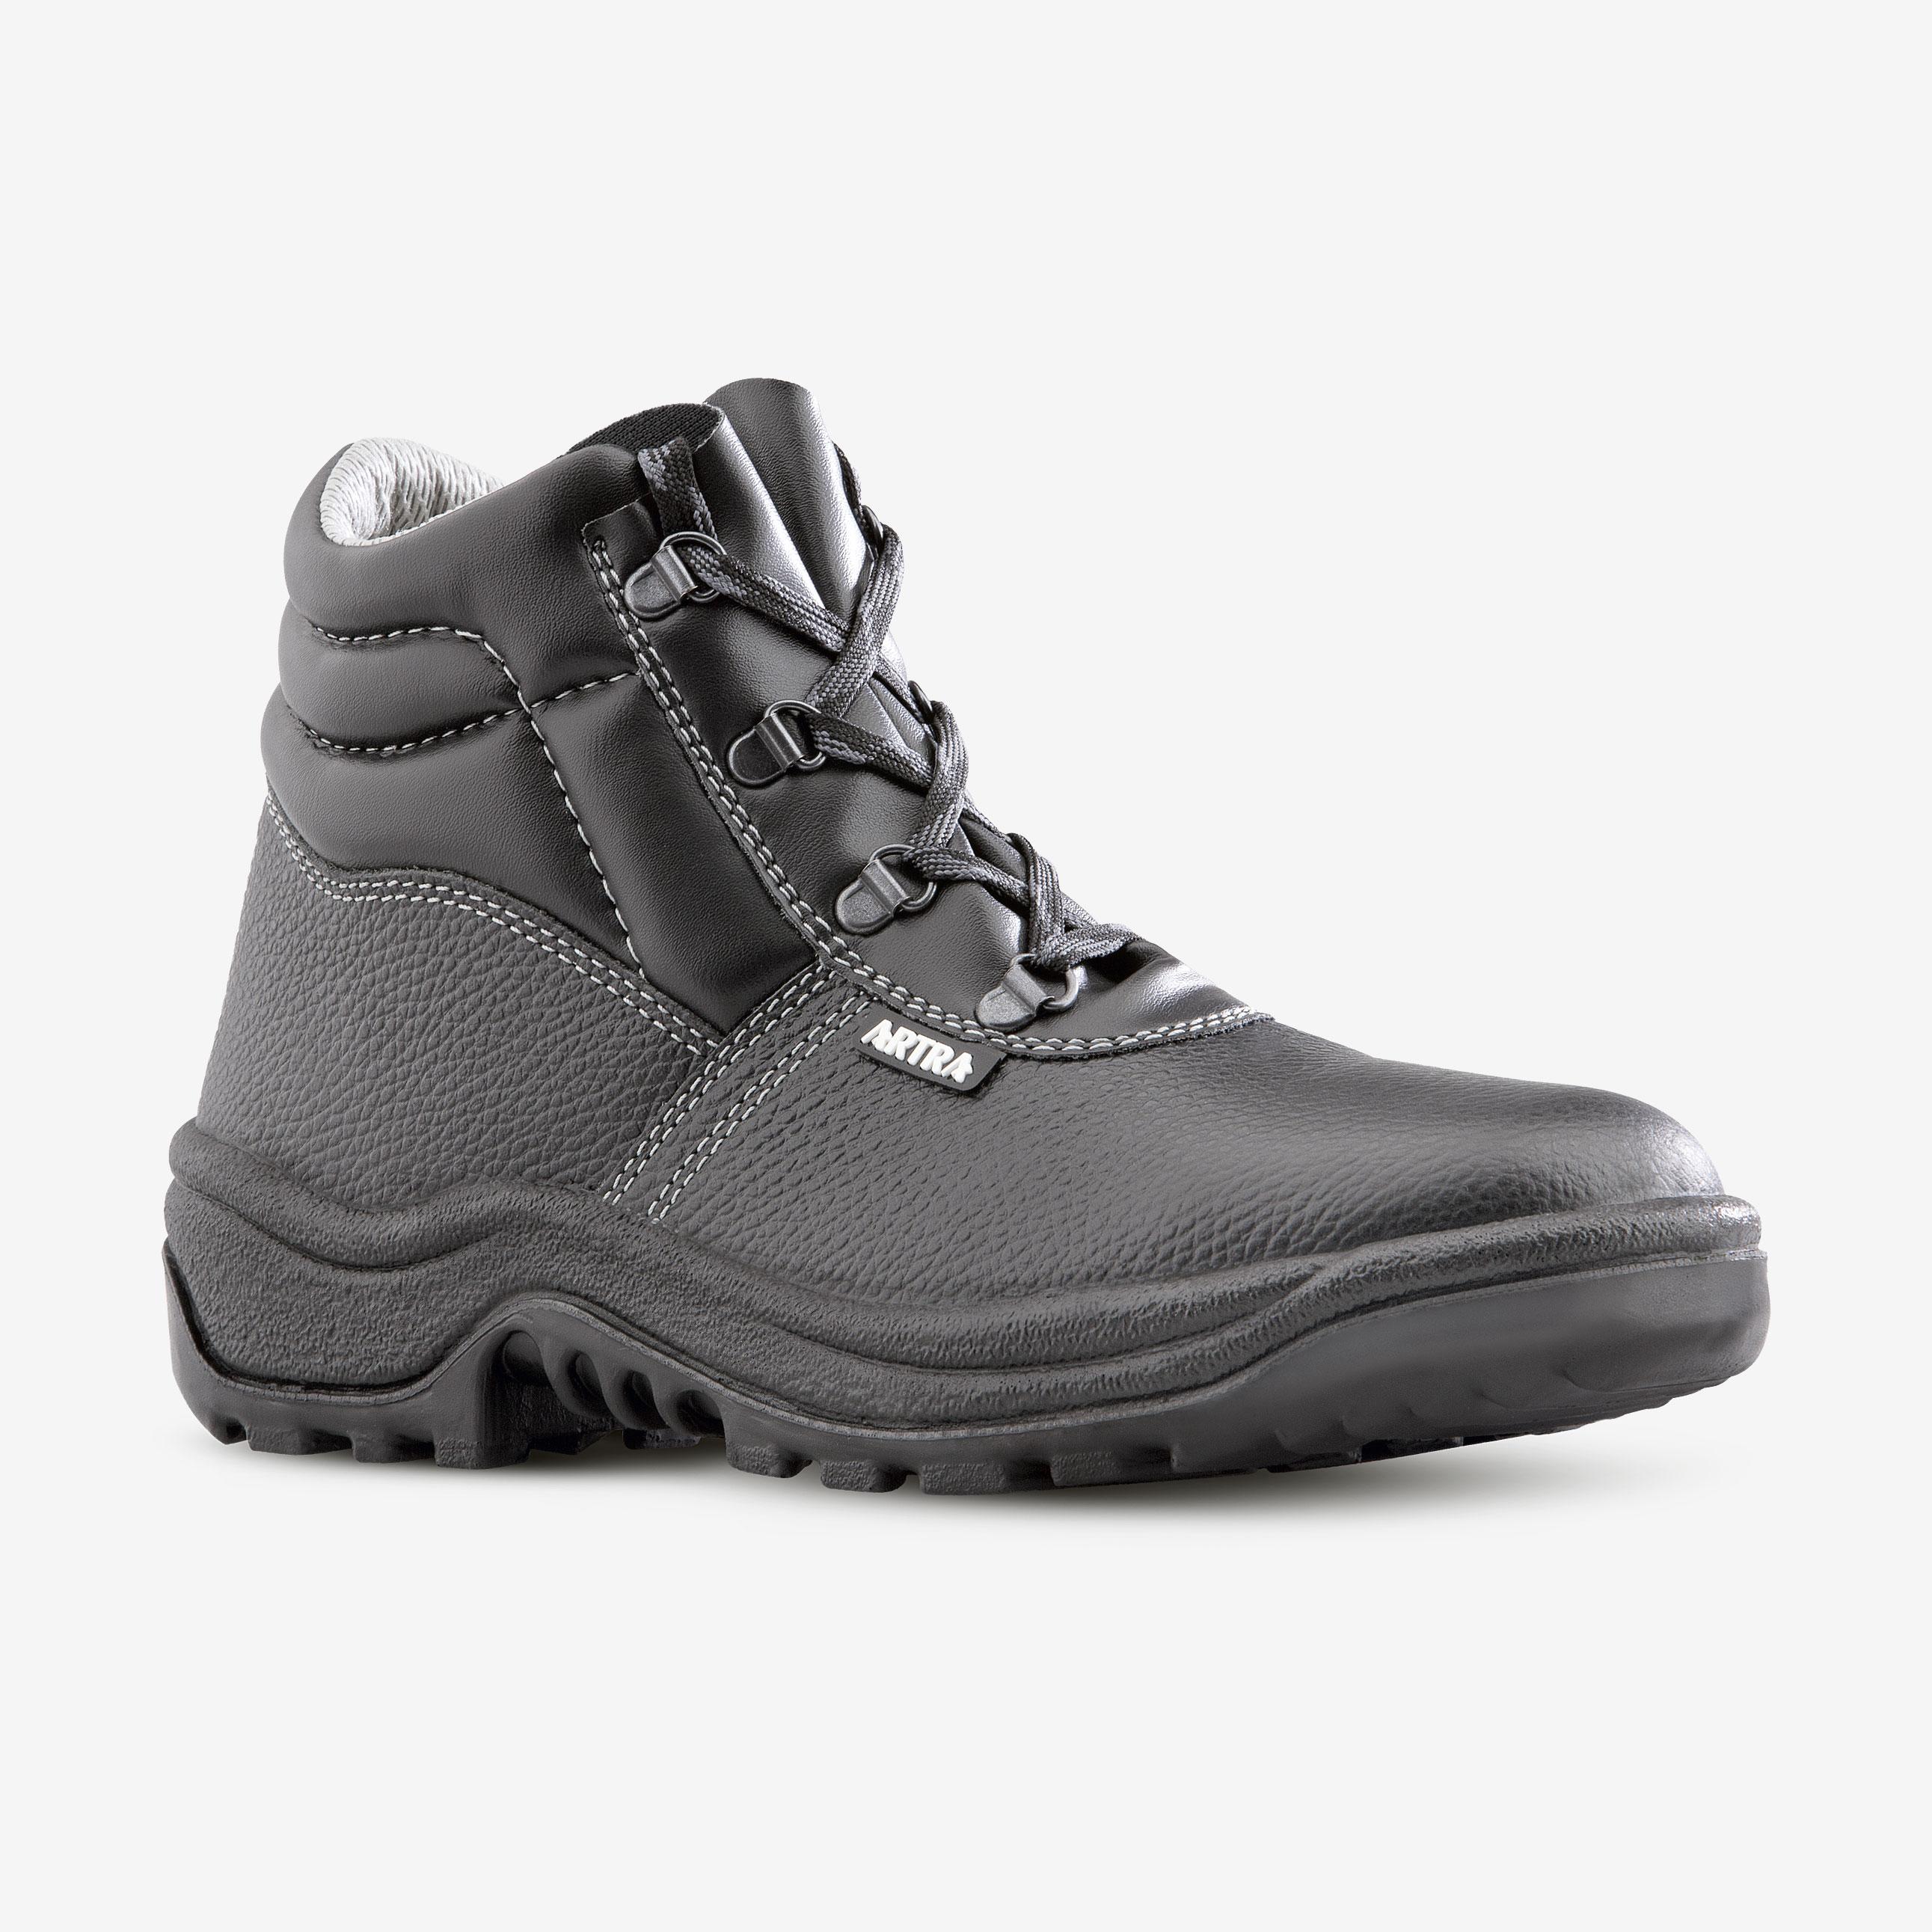 7a2c26a65fb7 ARTRA Work & Safety ARAUKAN 940 6060 S1 lábbeli, cipő